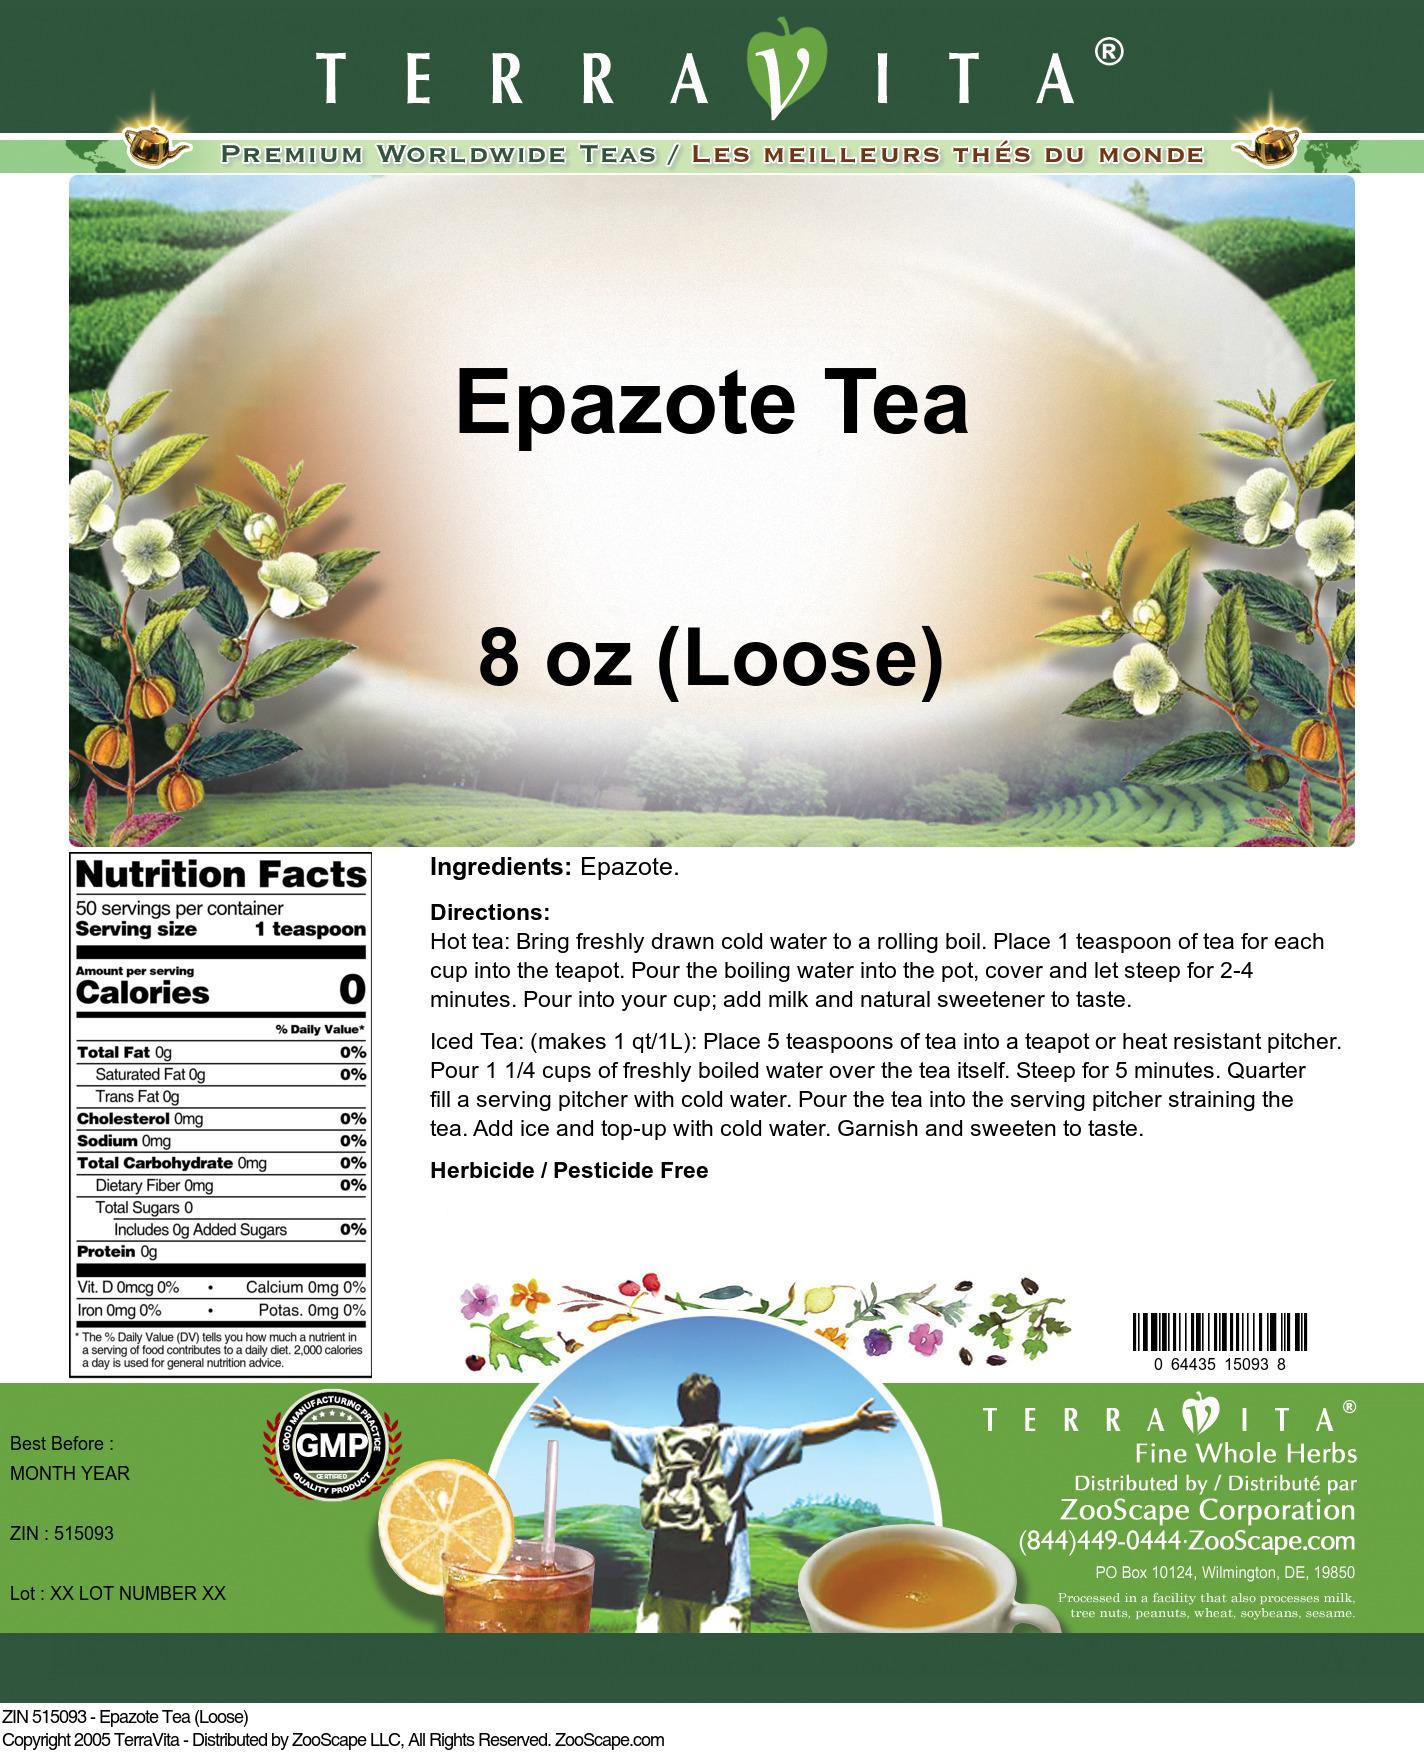 Epazote Tea (Loose)